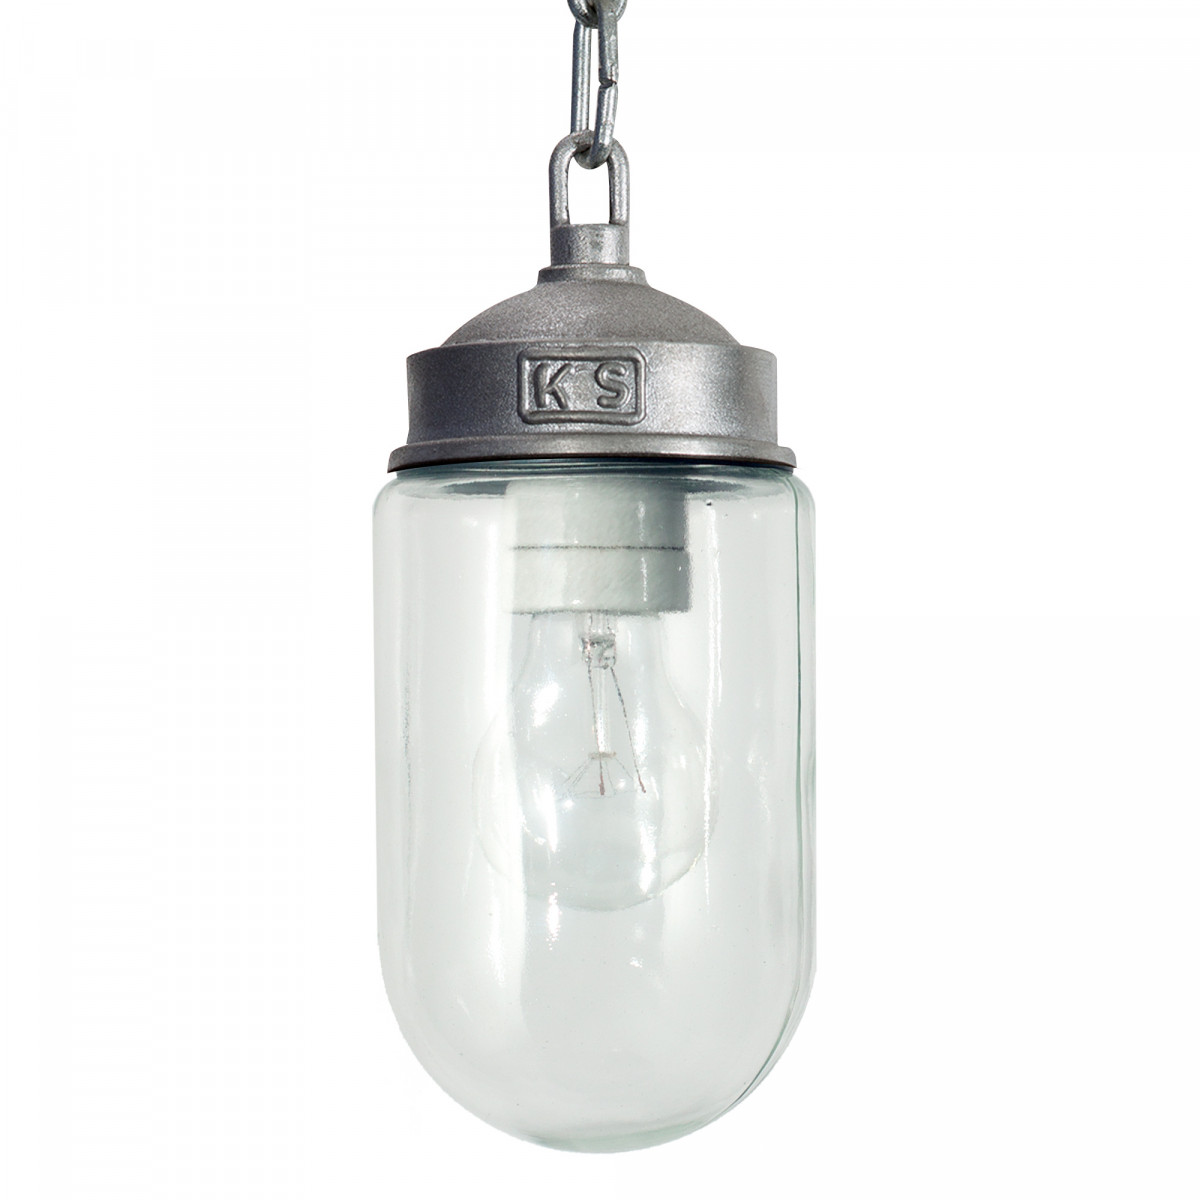 Industriele Kettinglamp One-Eighty Chain